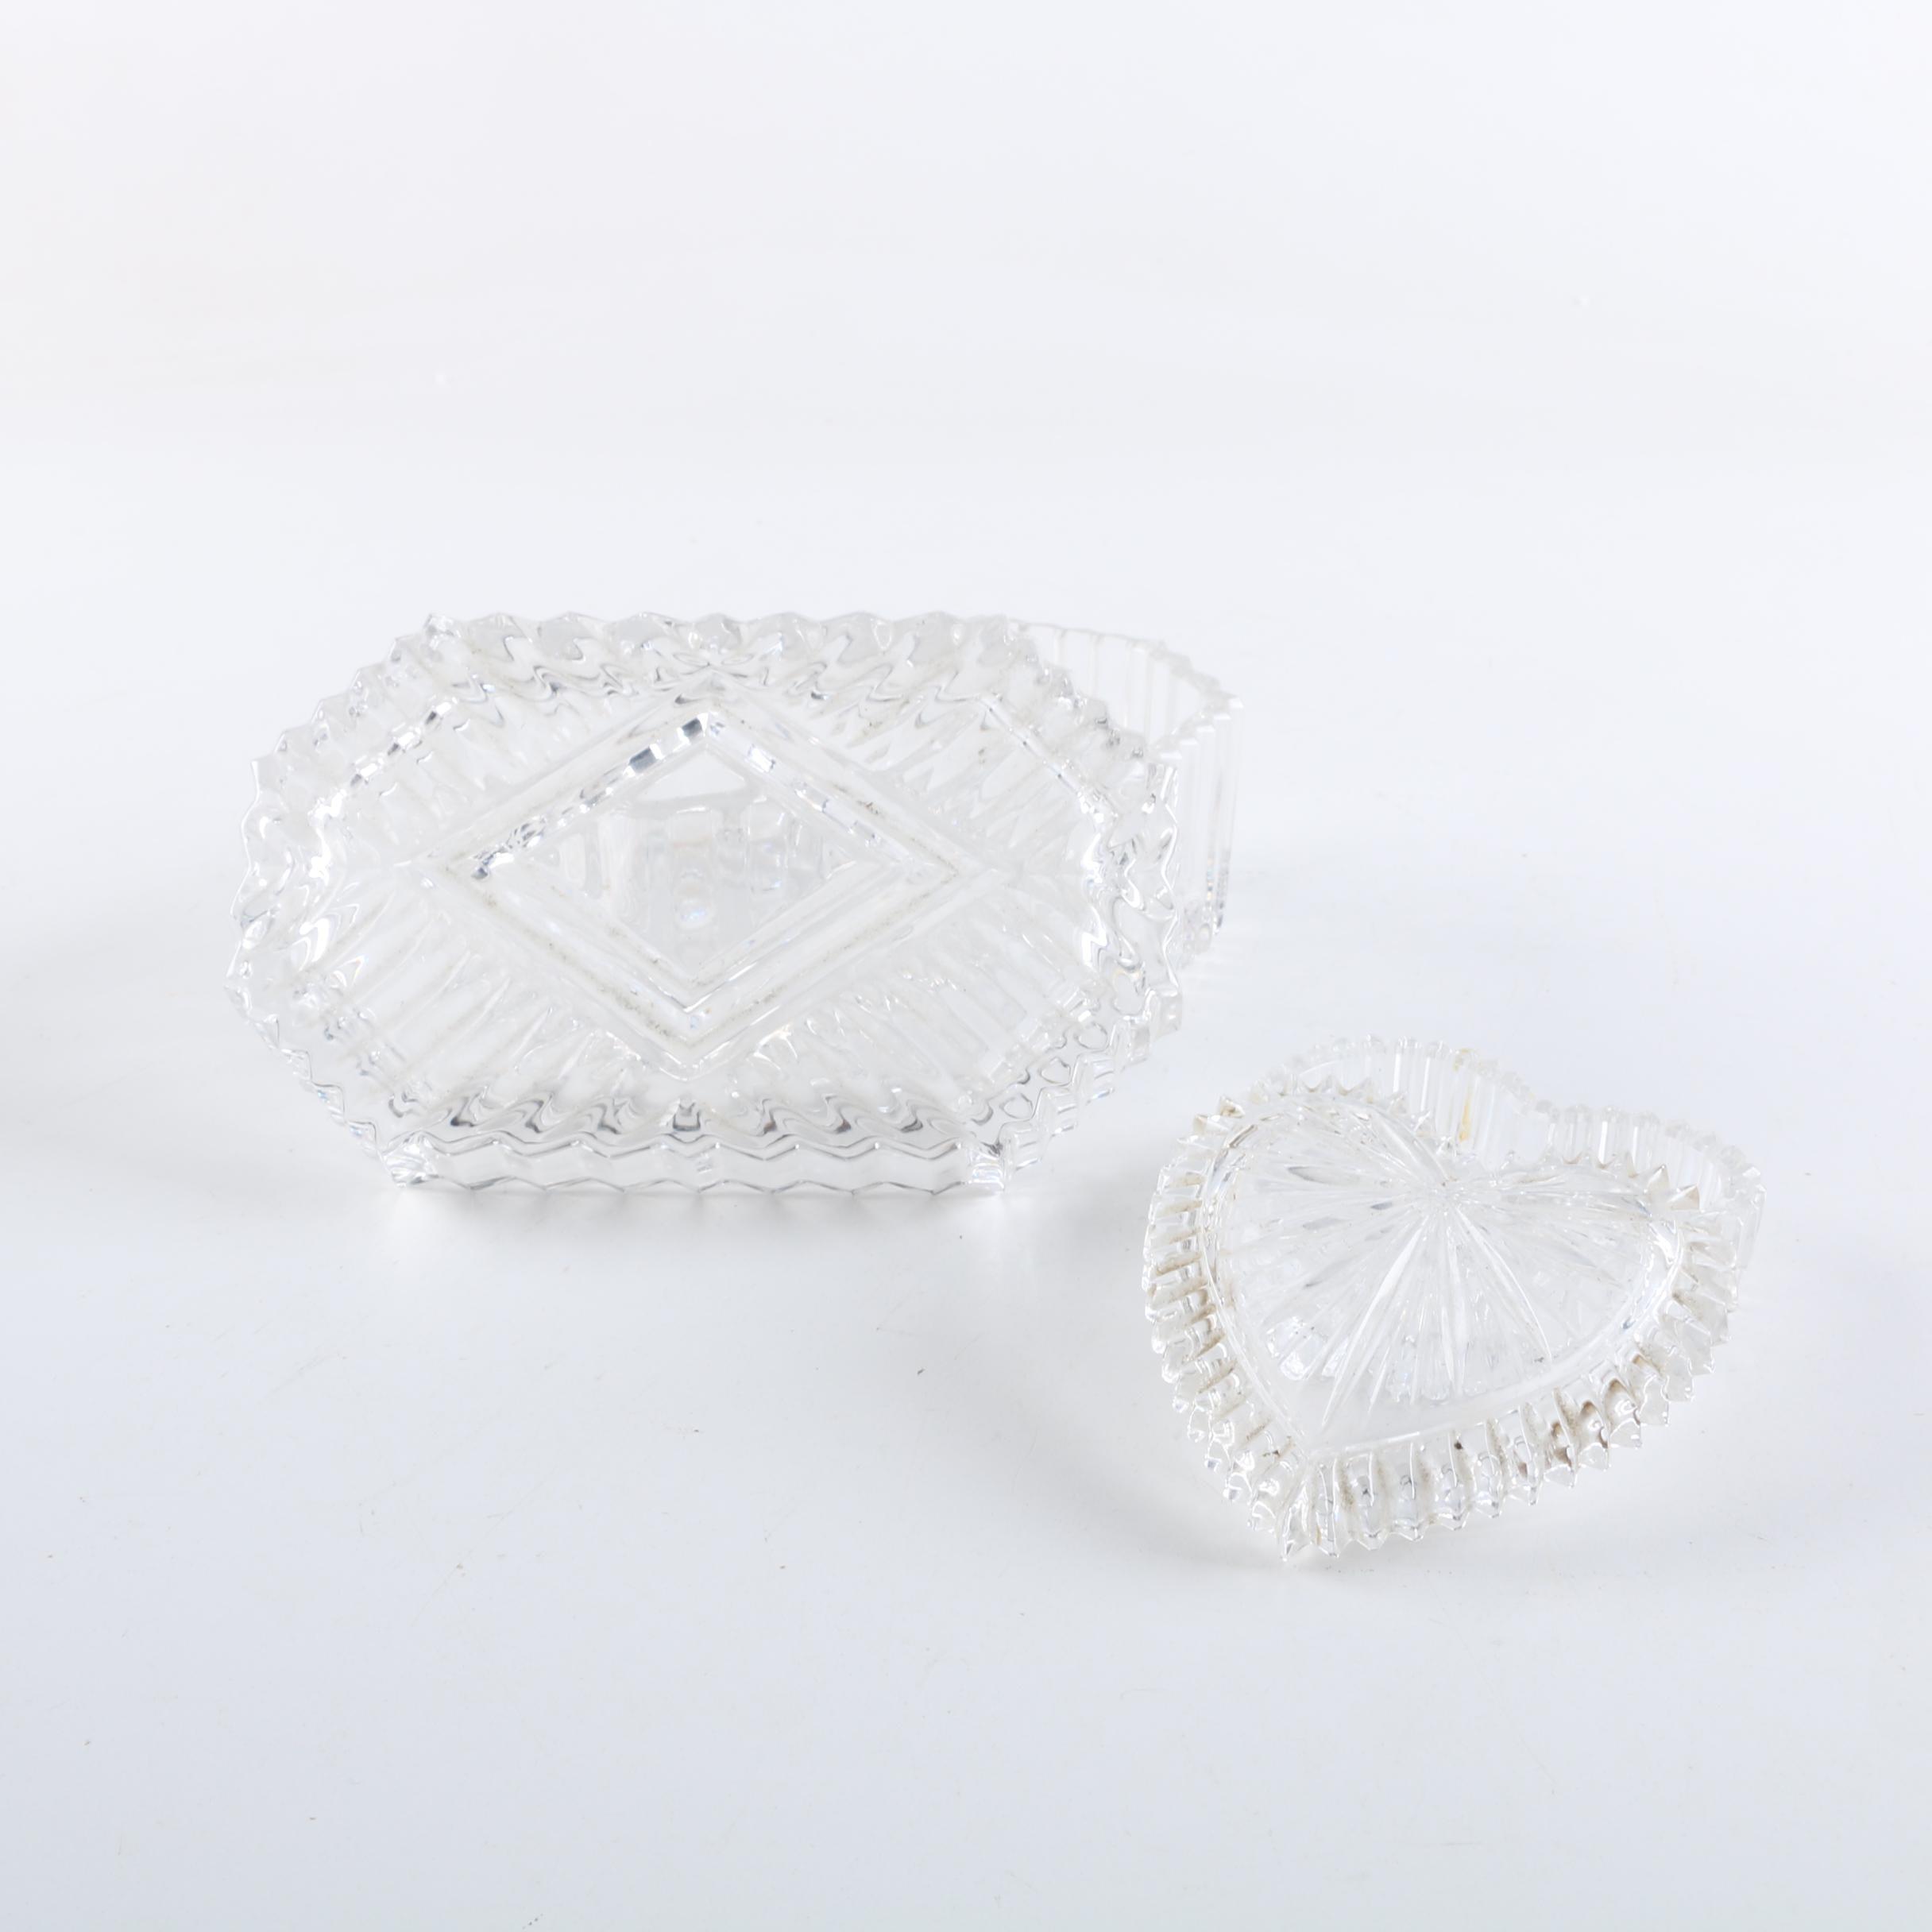 Pressed Glass Trinket Boxes